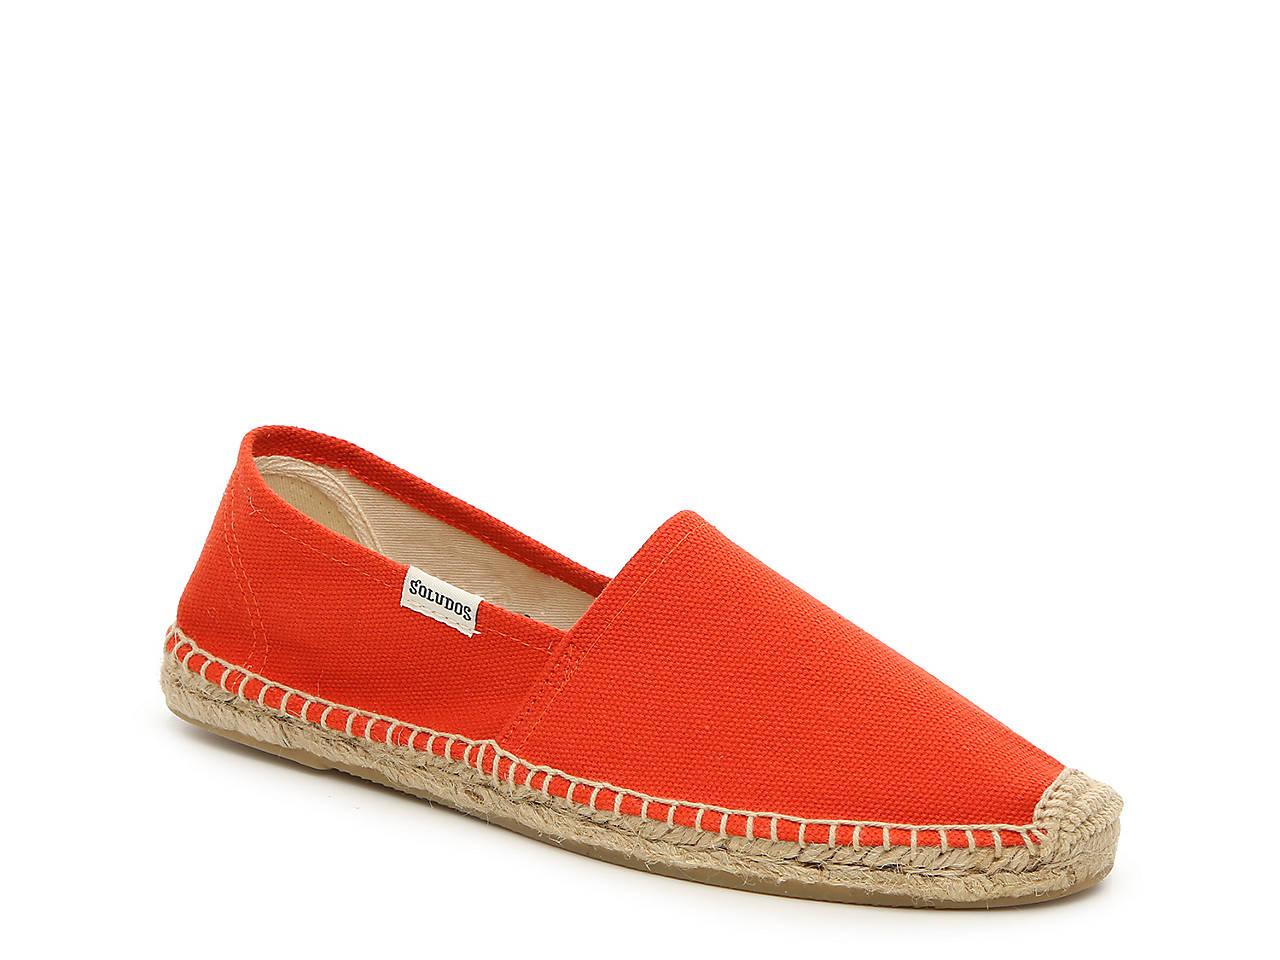 63ff4230df93 Soludos Original Dali 2 Slip-On Women s Shoes